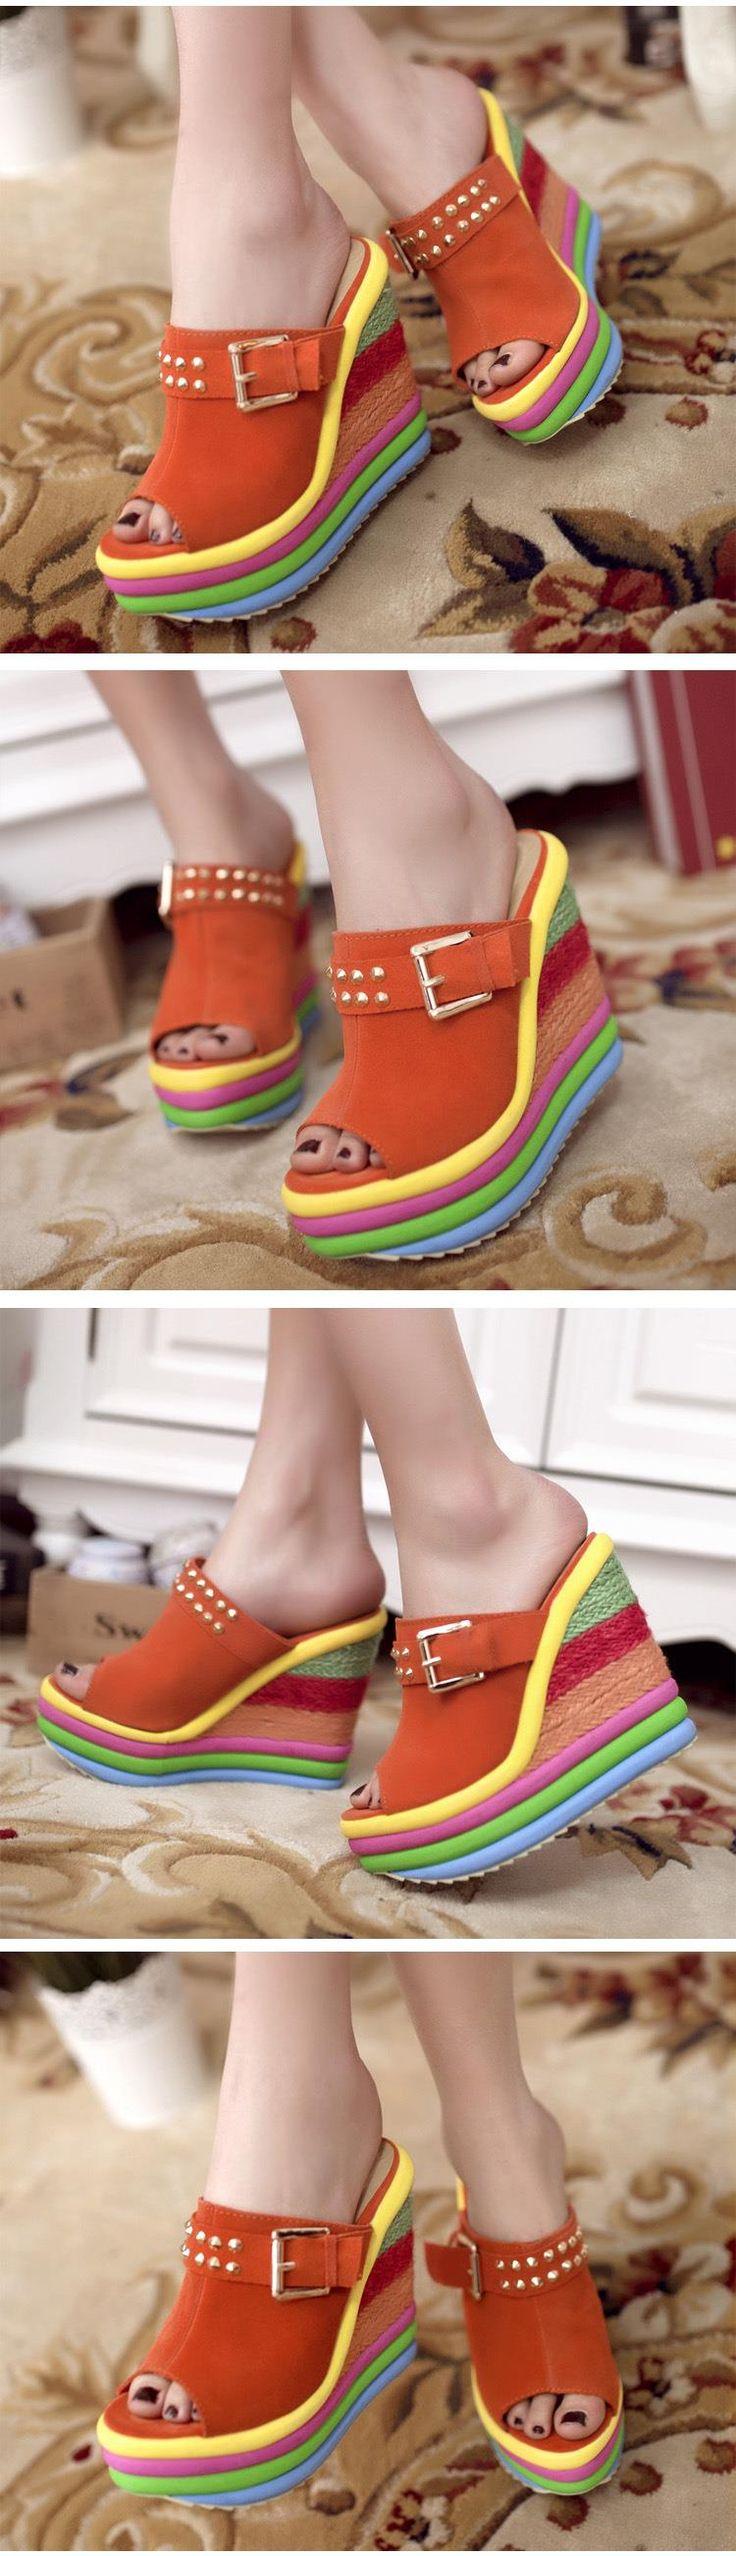 VISIT --> http://playertronics.com/products/new-2016-summer-beach-flip-flops-beach-slippers-platform-sandals-womens-wedges-shoes-ladies-flip-flops-zapatos-mujer/ http://playertronics.com/products/new-2016-summer-beach-flip-flops-beach-slippers-platform-sandals-womens-wedges-shoes-ladies-flip-flops-zapatos-mujer/